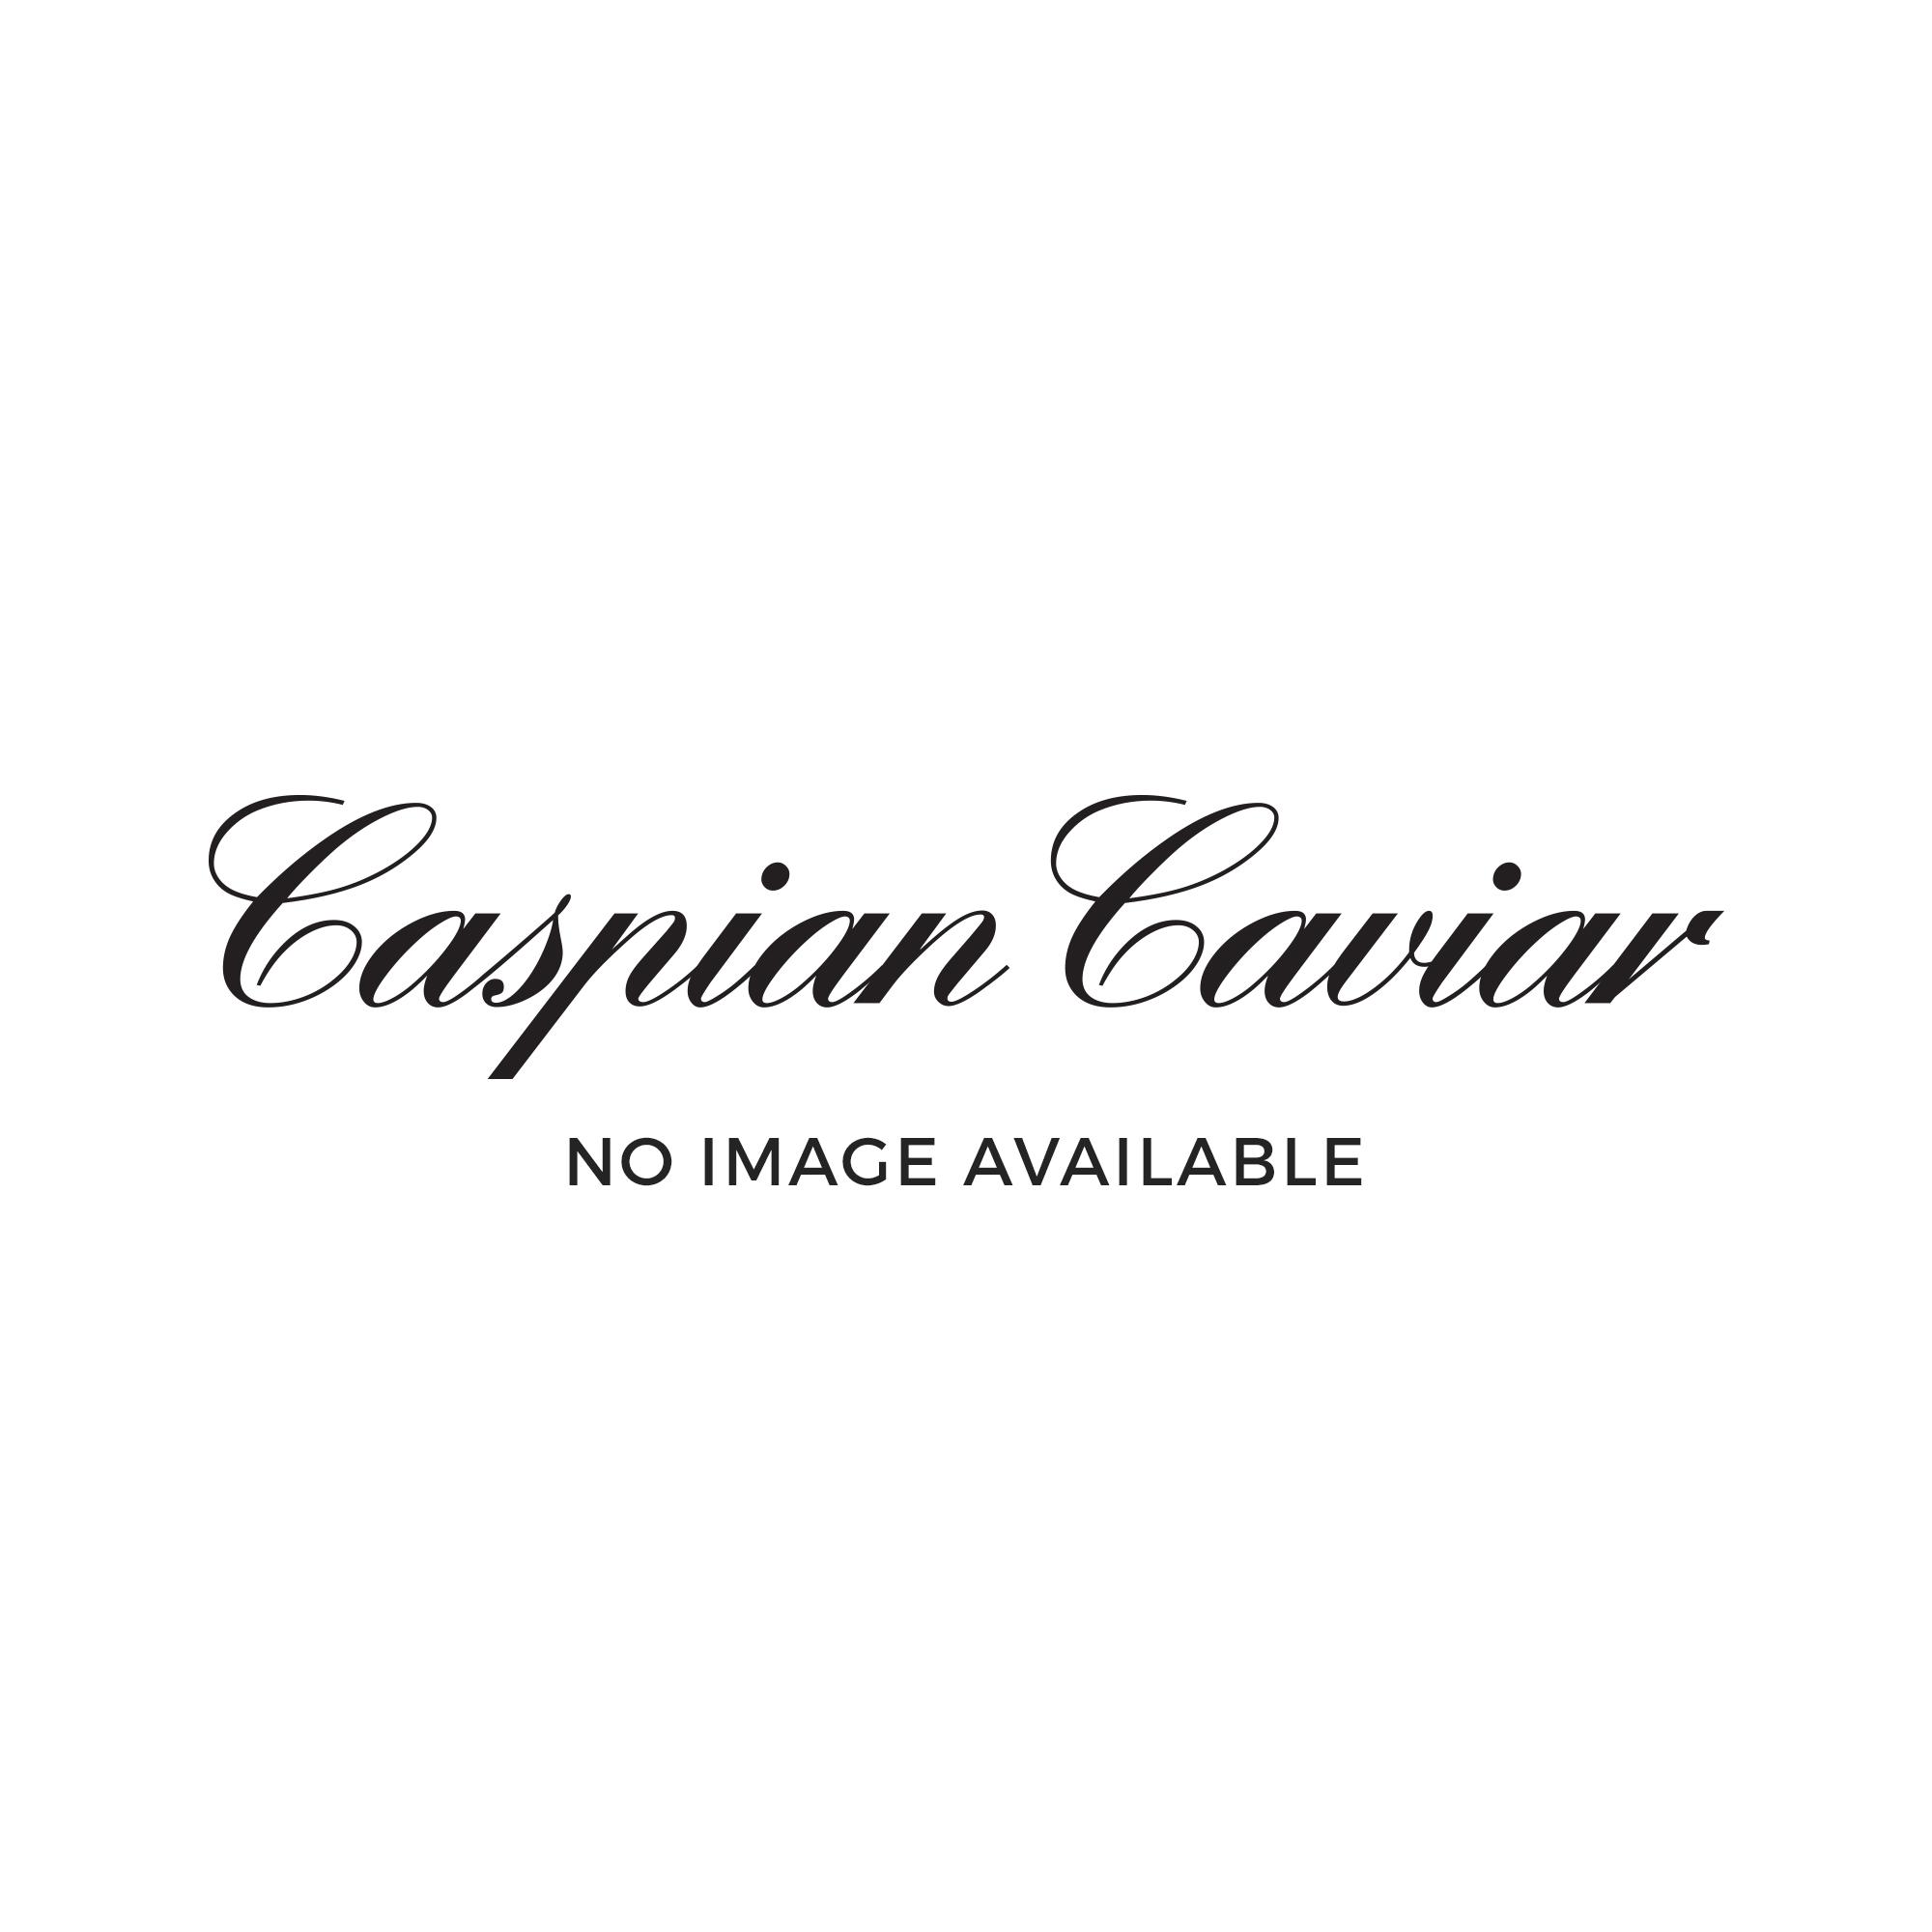 Caspian Caviar White 125g